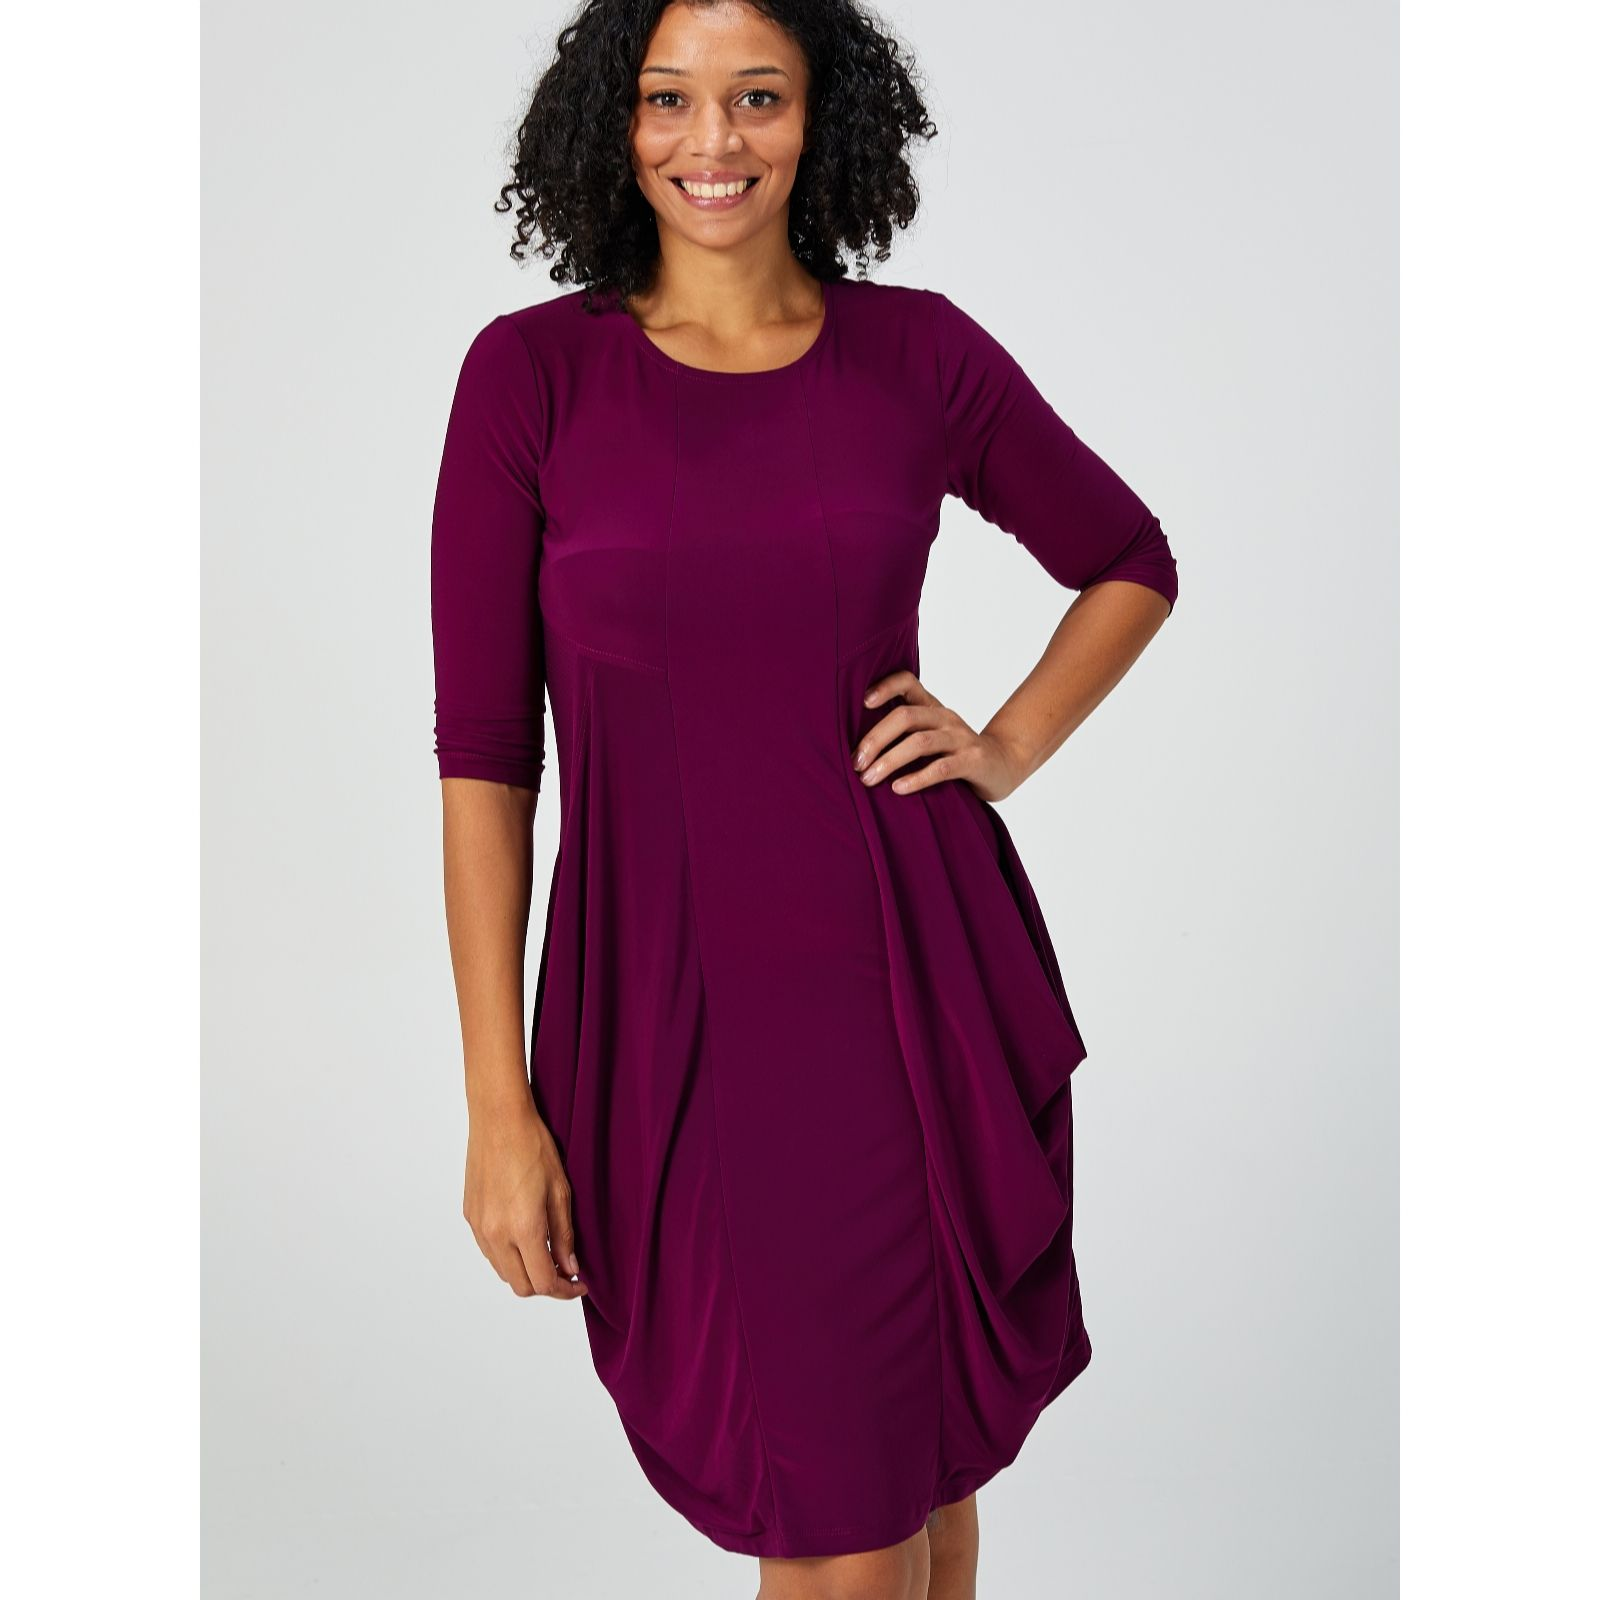 5a9140f35ca 3 4 Sleeve Draped Pocket Dress with Asymmetric Hem by Nina Leonard - QVC UK